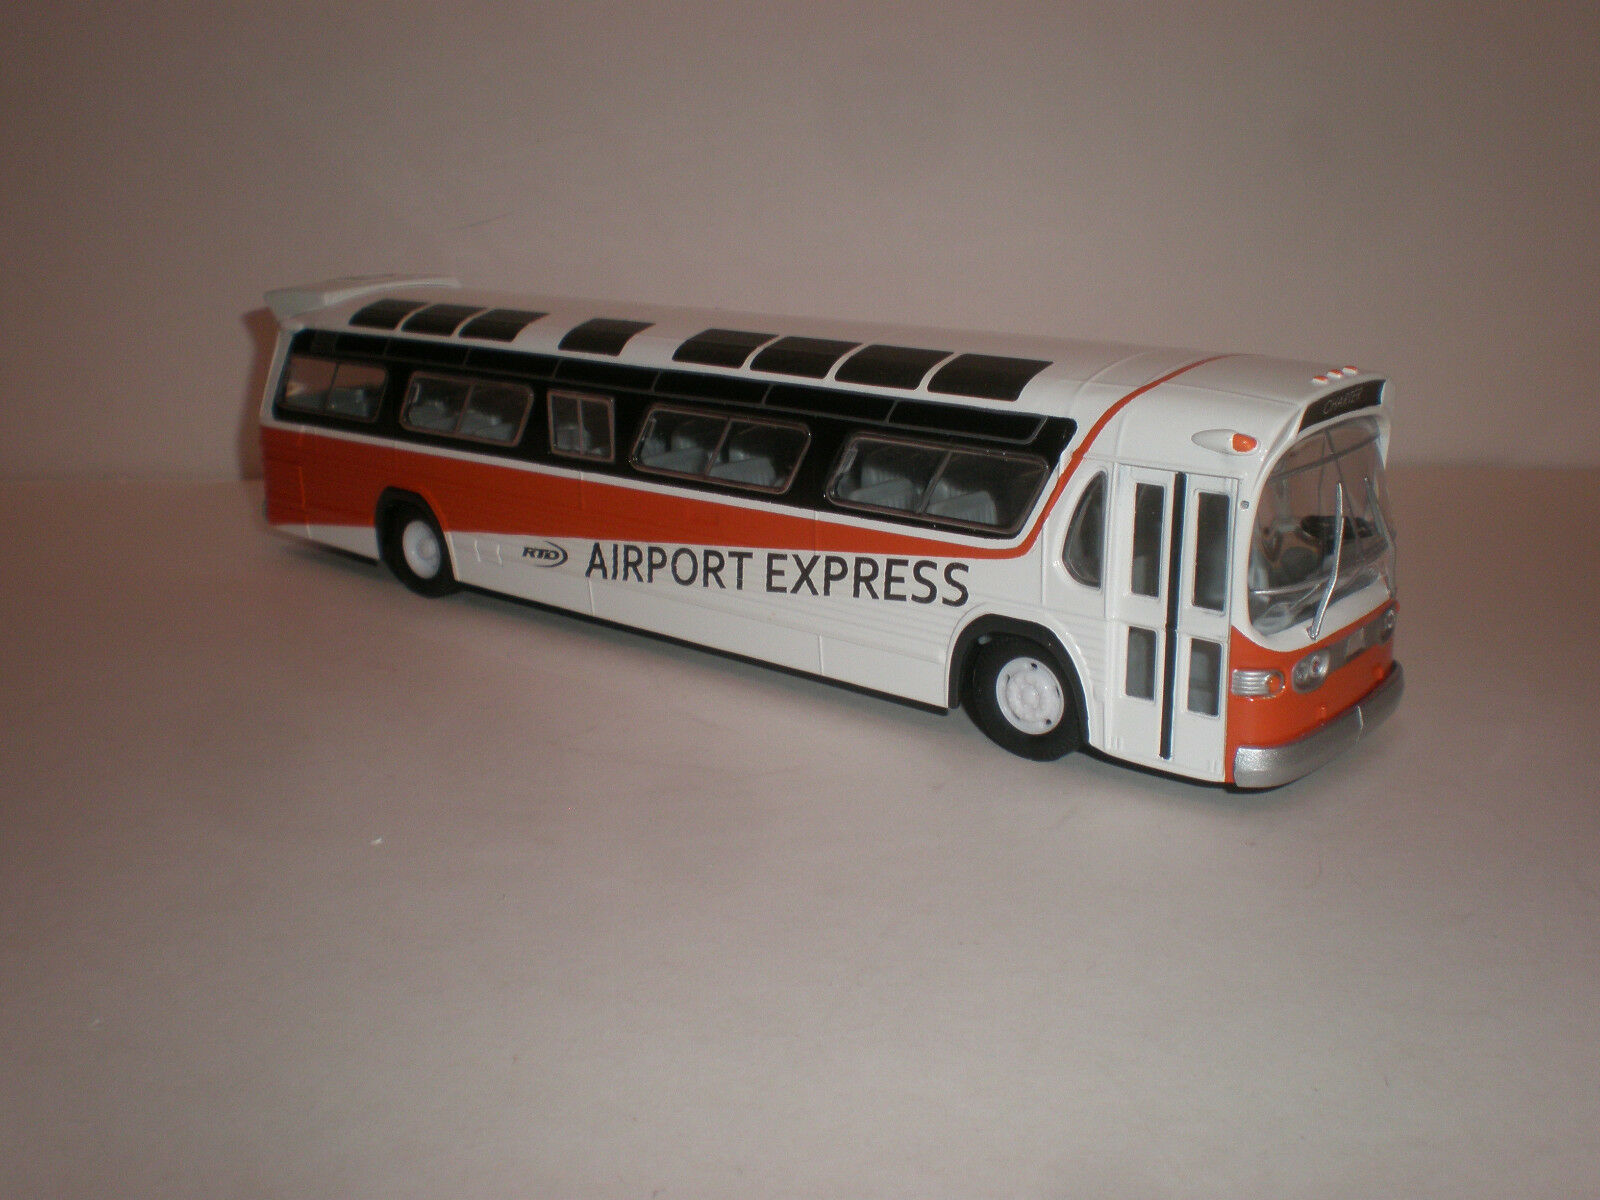 1/50 Corgi bus Fishbowl RTD  Airport Express  custom painted